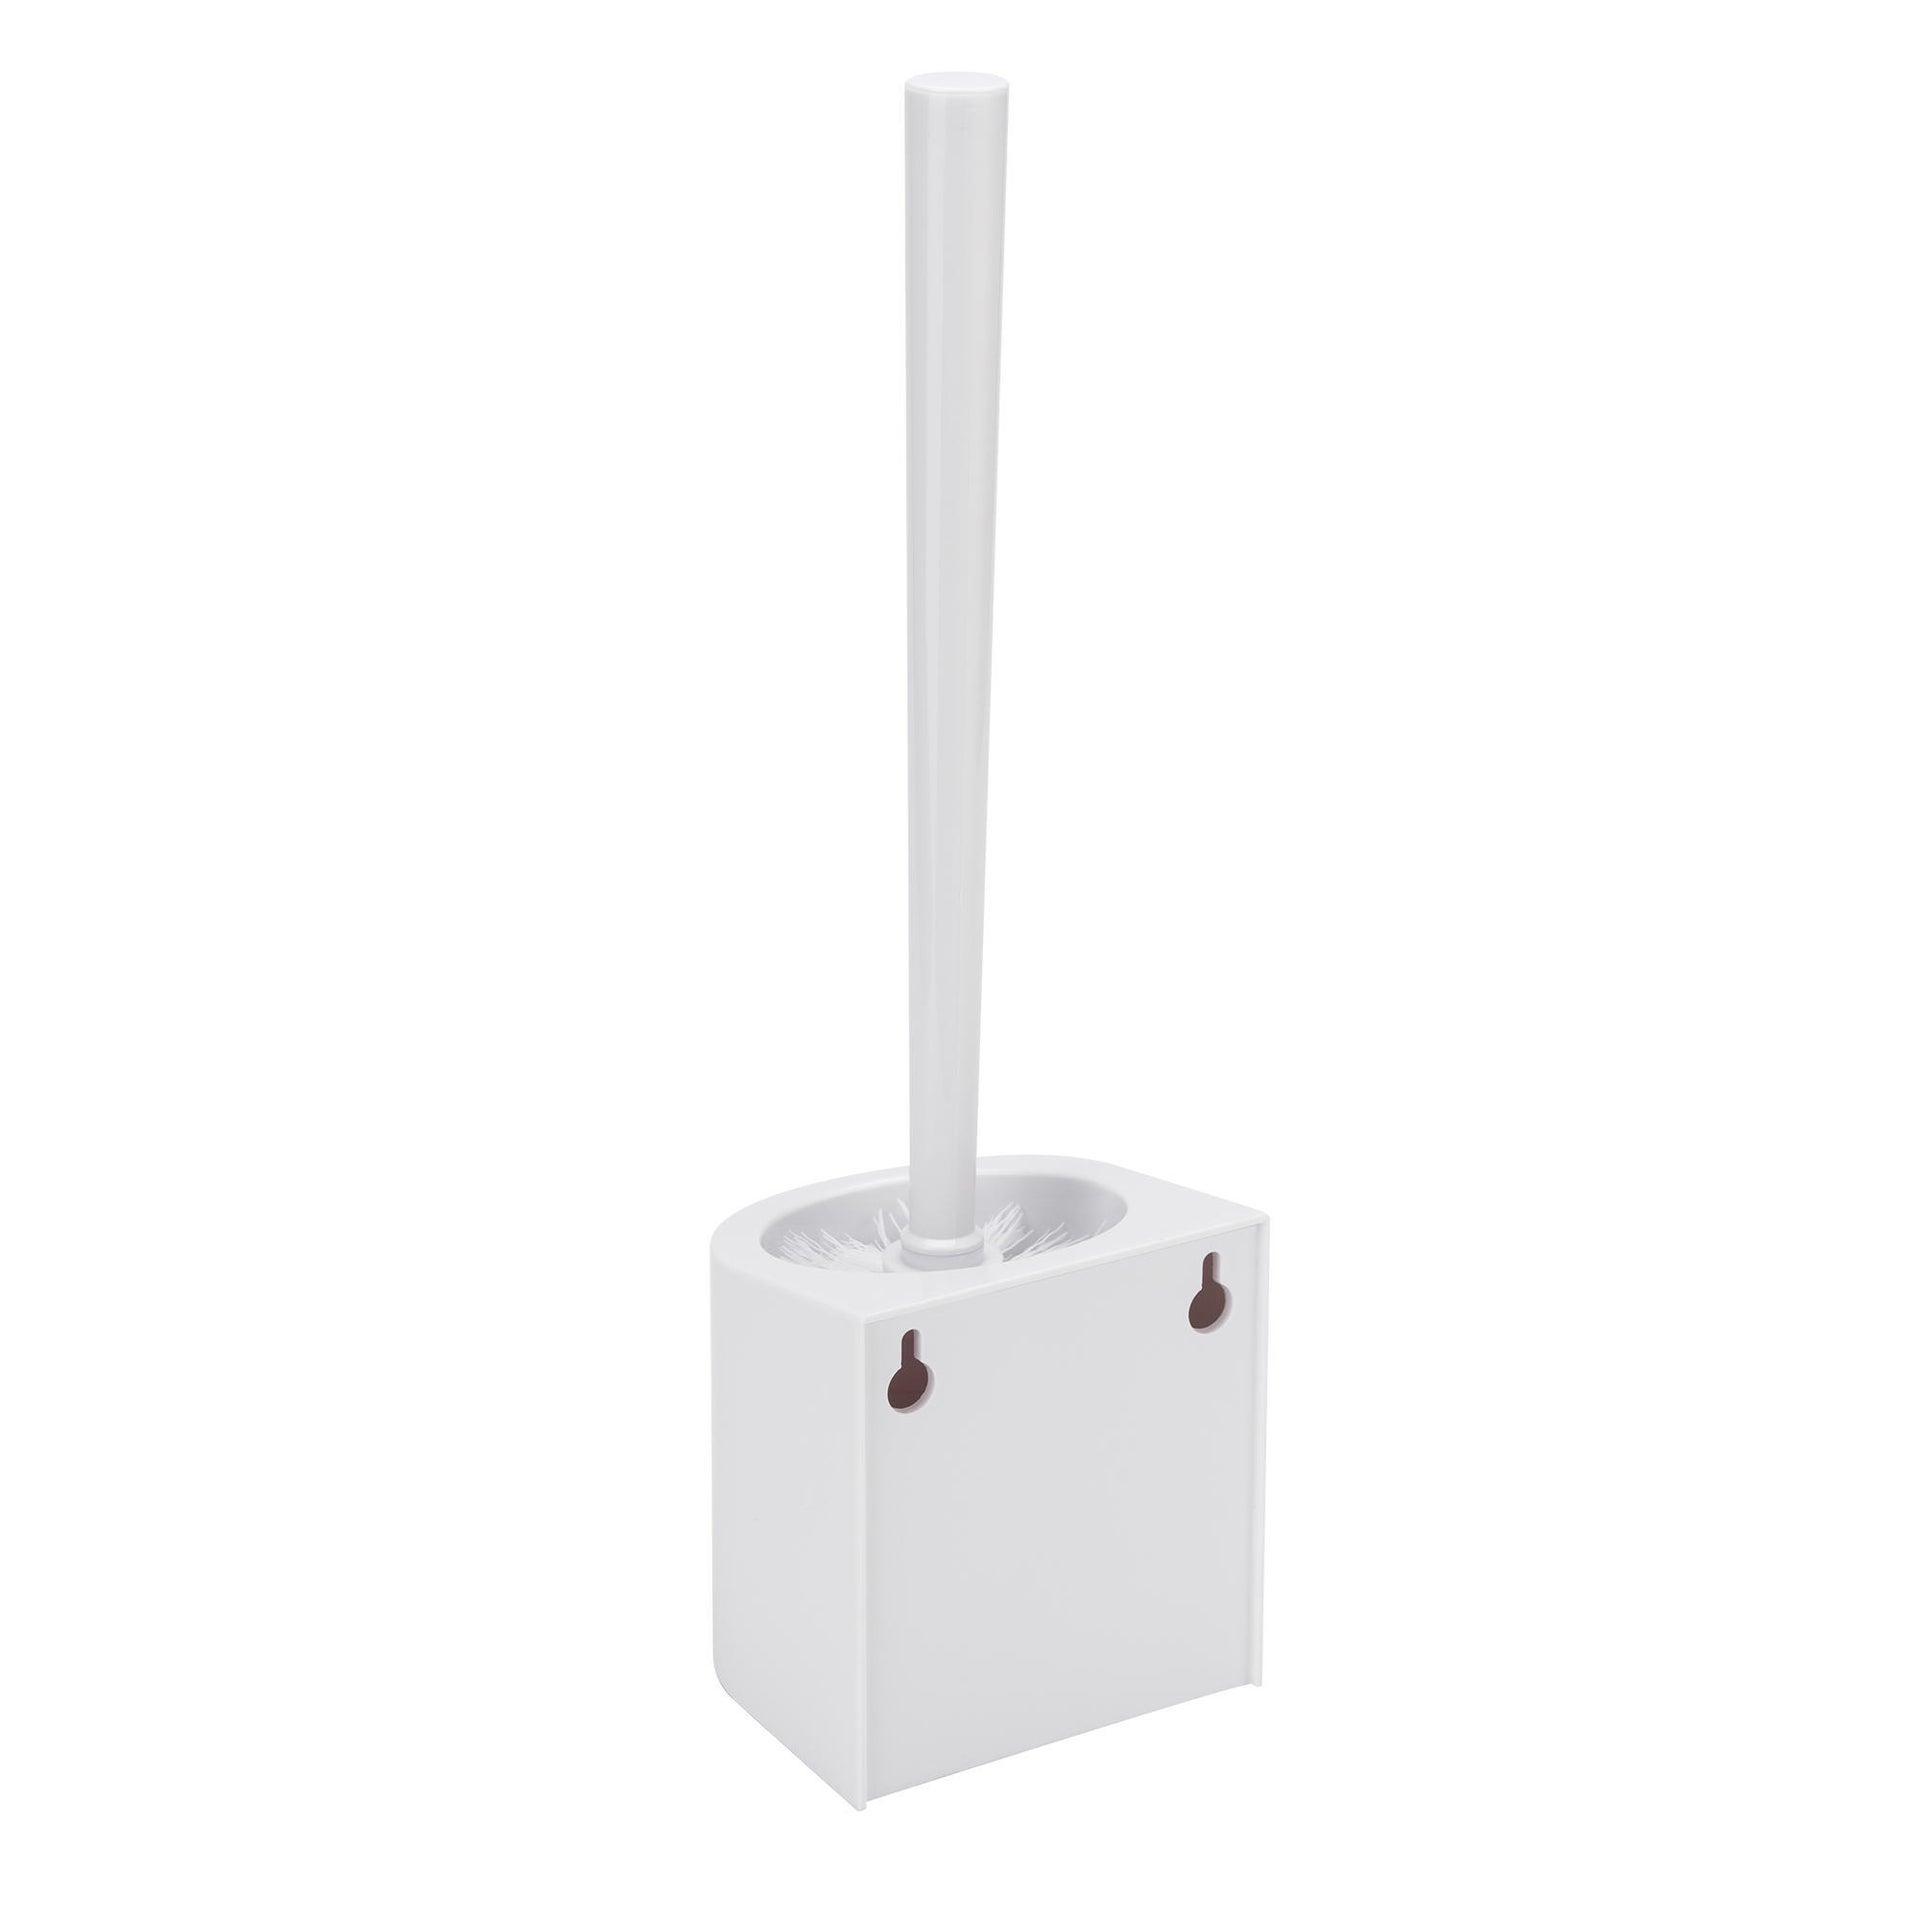 Porta scopino wc a muro in abs bianco - 2